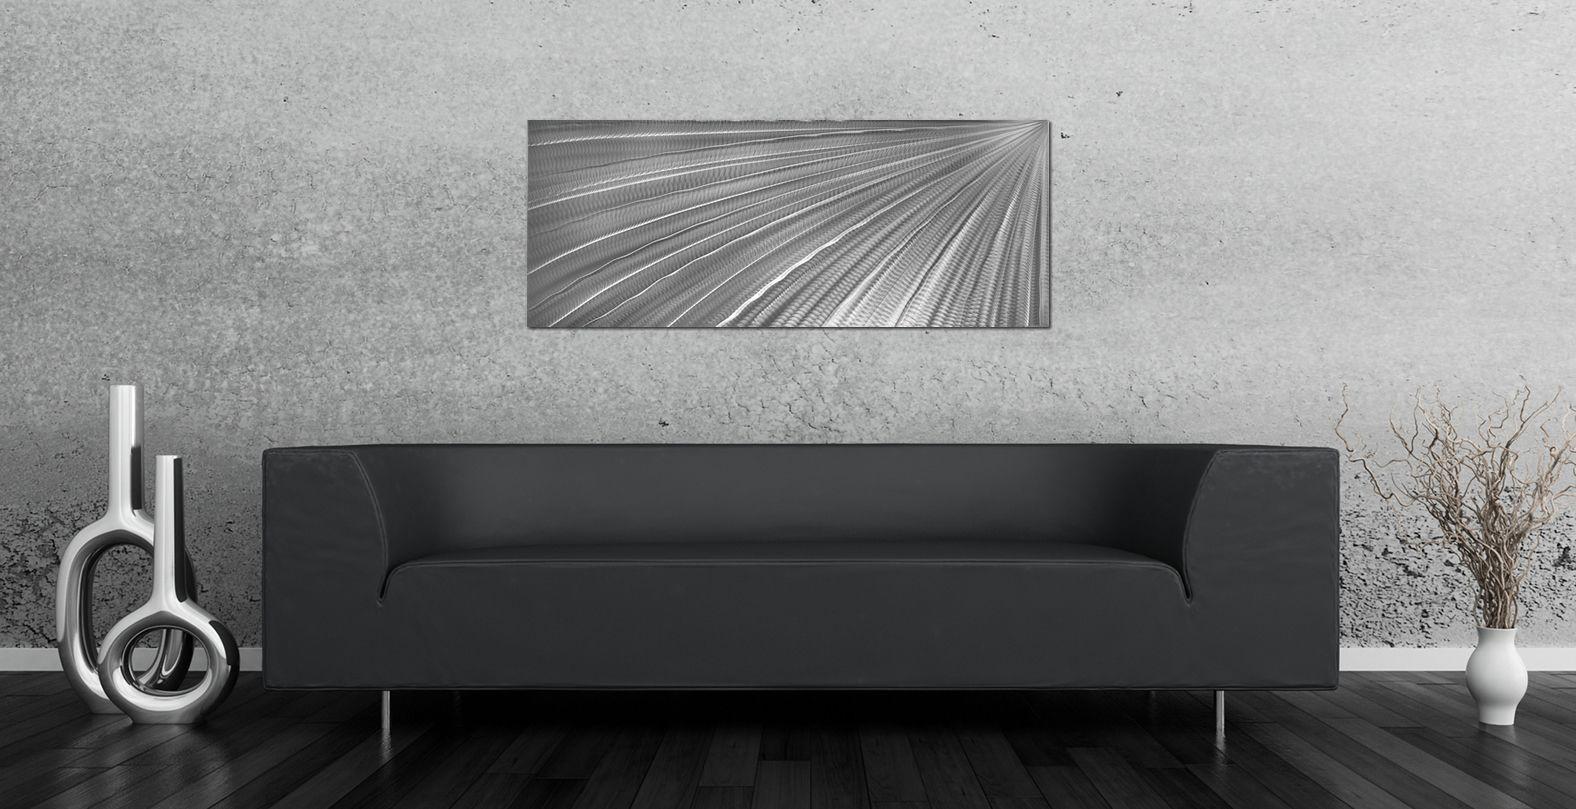 NY0600M - Metal Art by Nicholas Yust, Alternate Angle 2